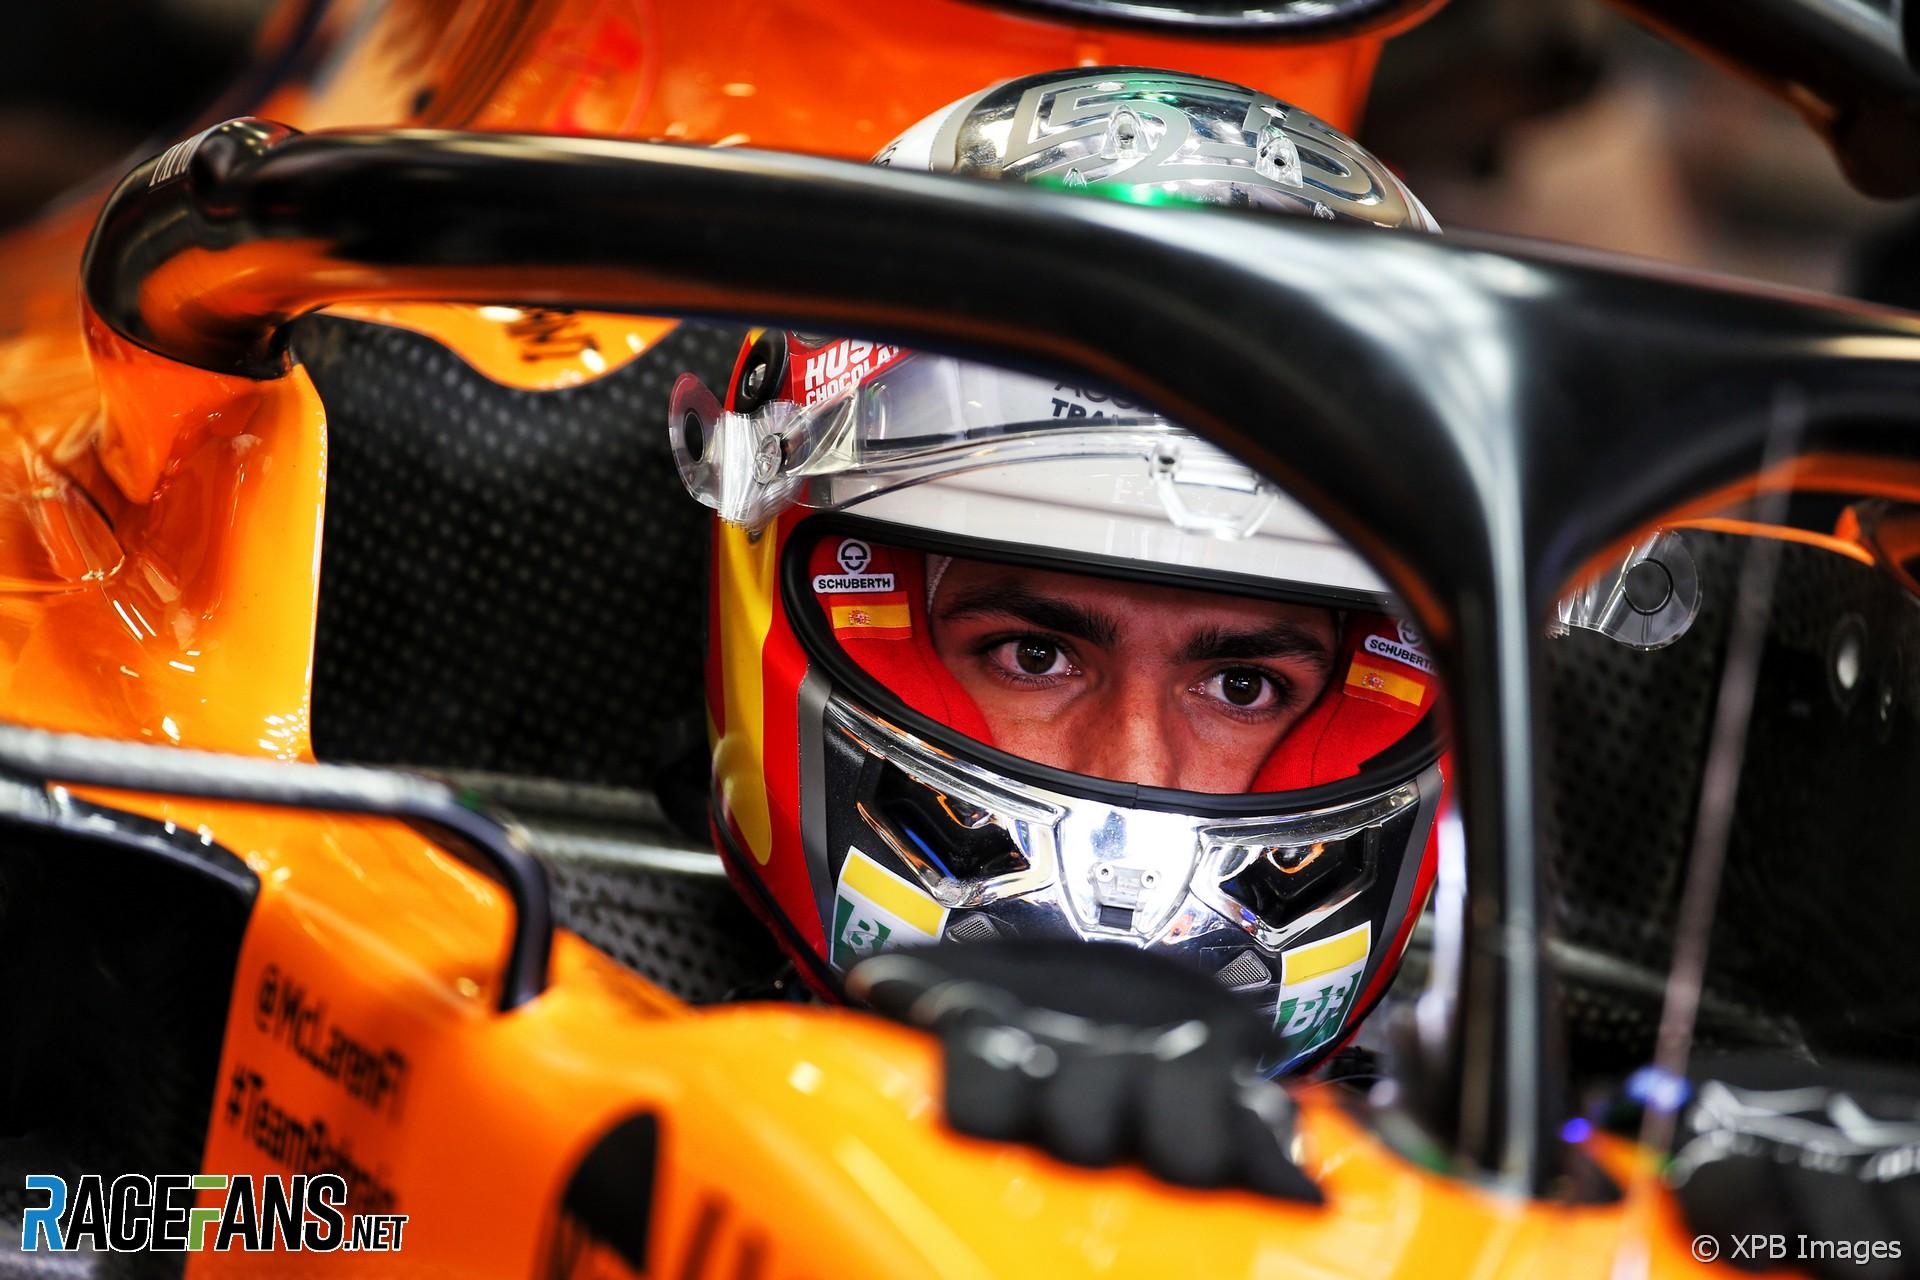 Carlos Sainz Jnr, McLaren, Monza, 2019